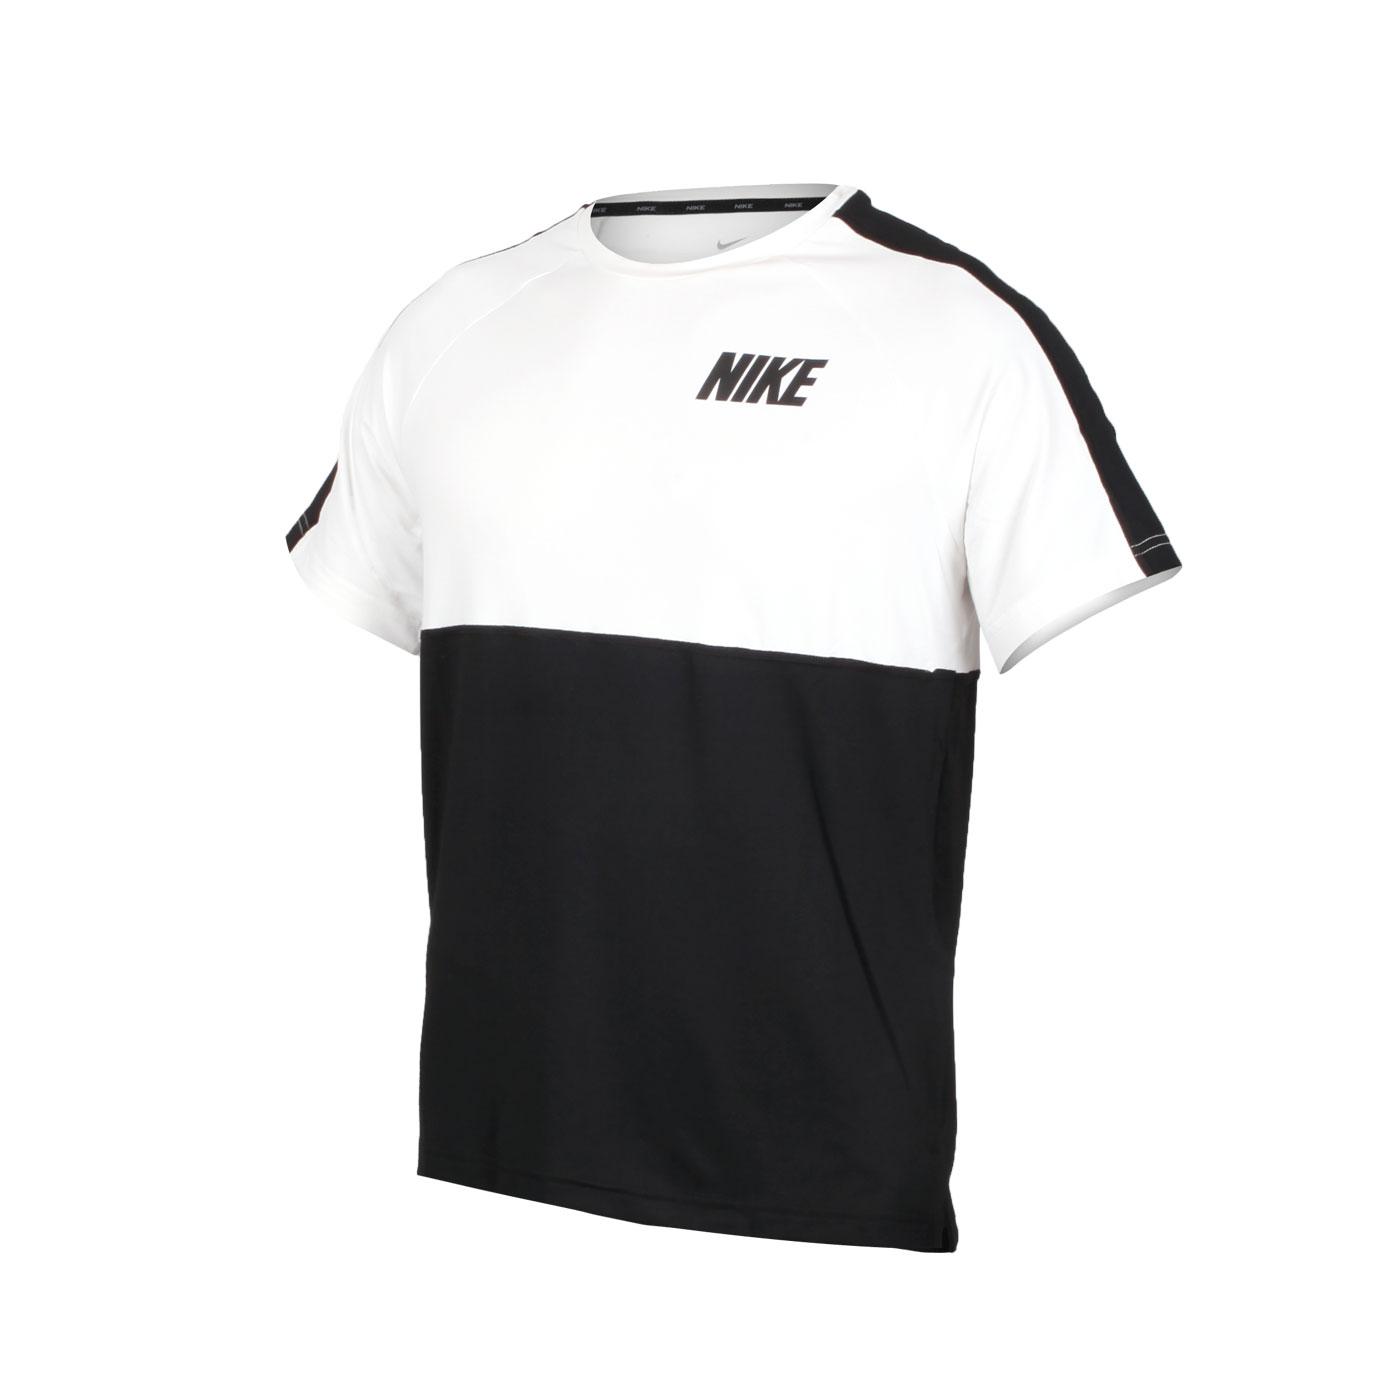 NIKE 男款短袖T恤 CU4047-100 - 白黑